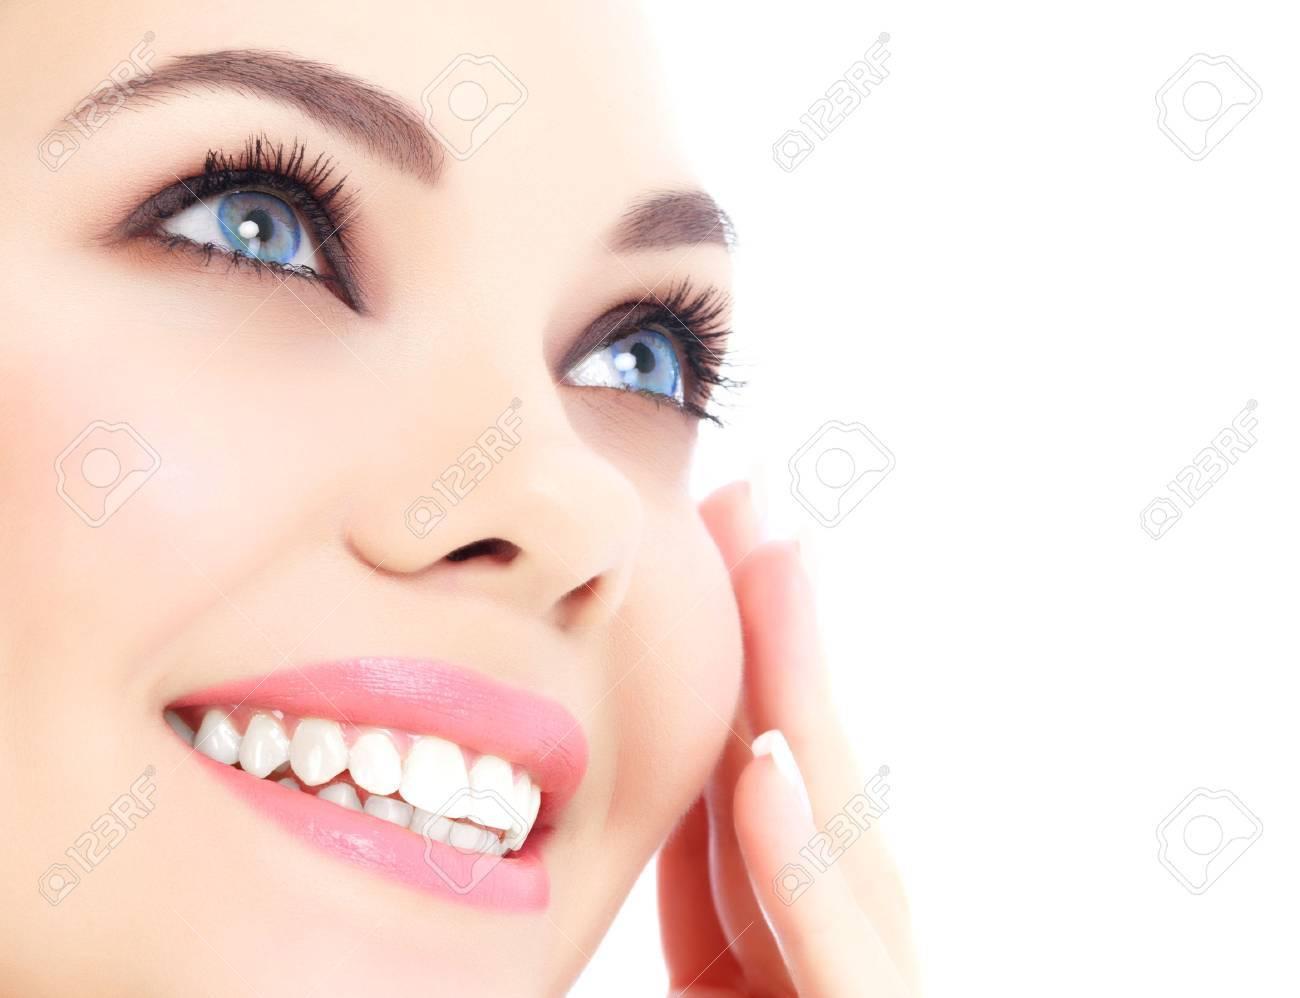 Cheerful female with fresh clear skin, white background. - 30533799